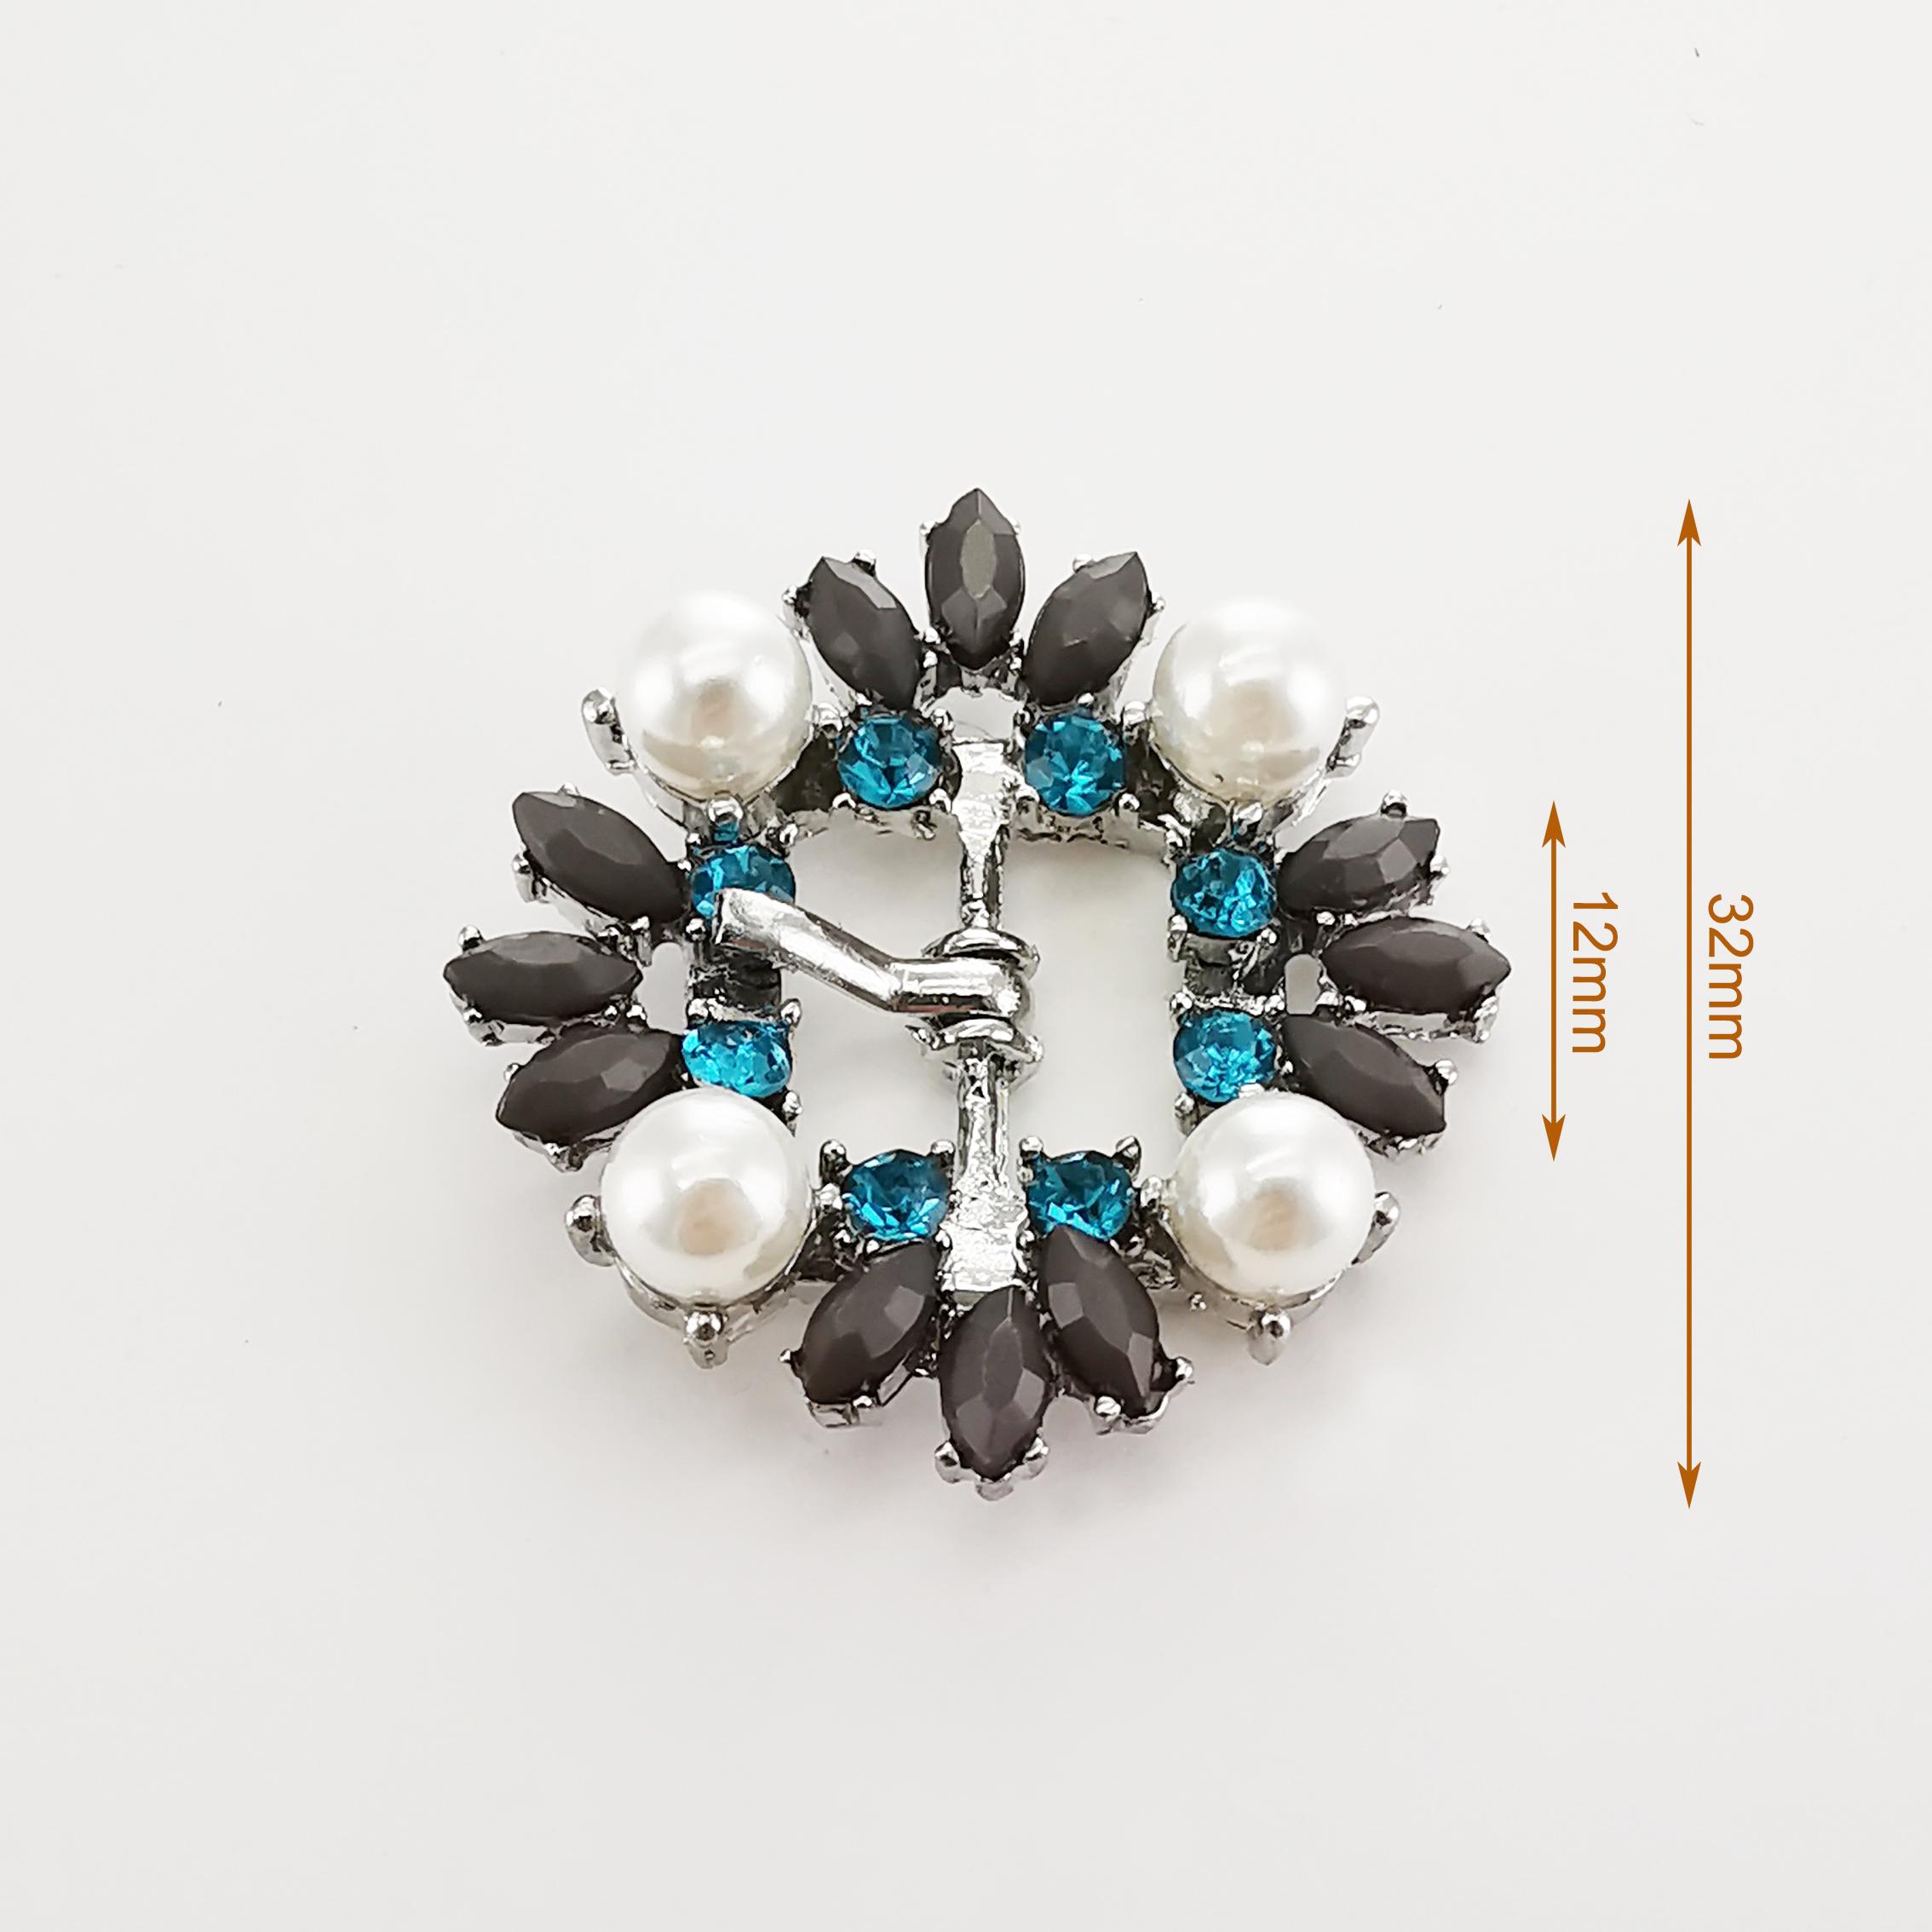 crystal stone rhinestone pearl  shoe  buckle  decoration